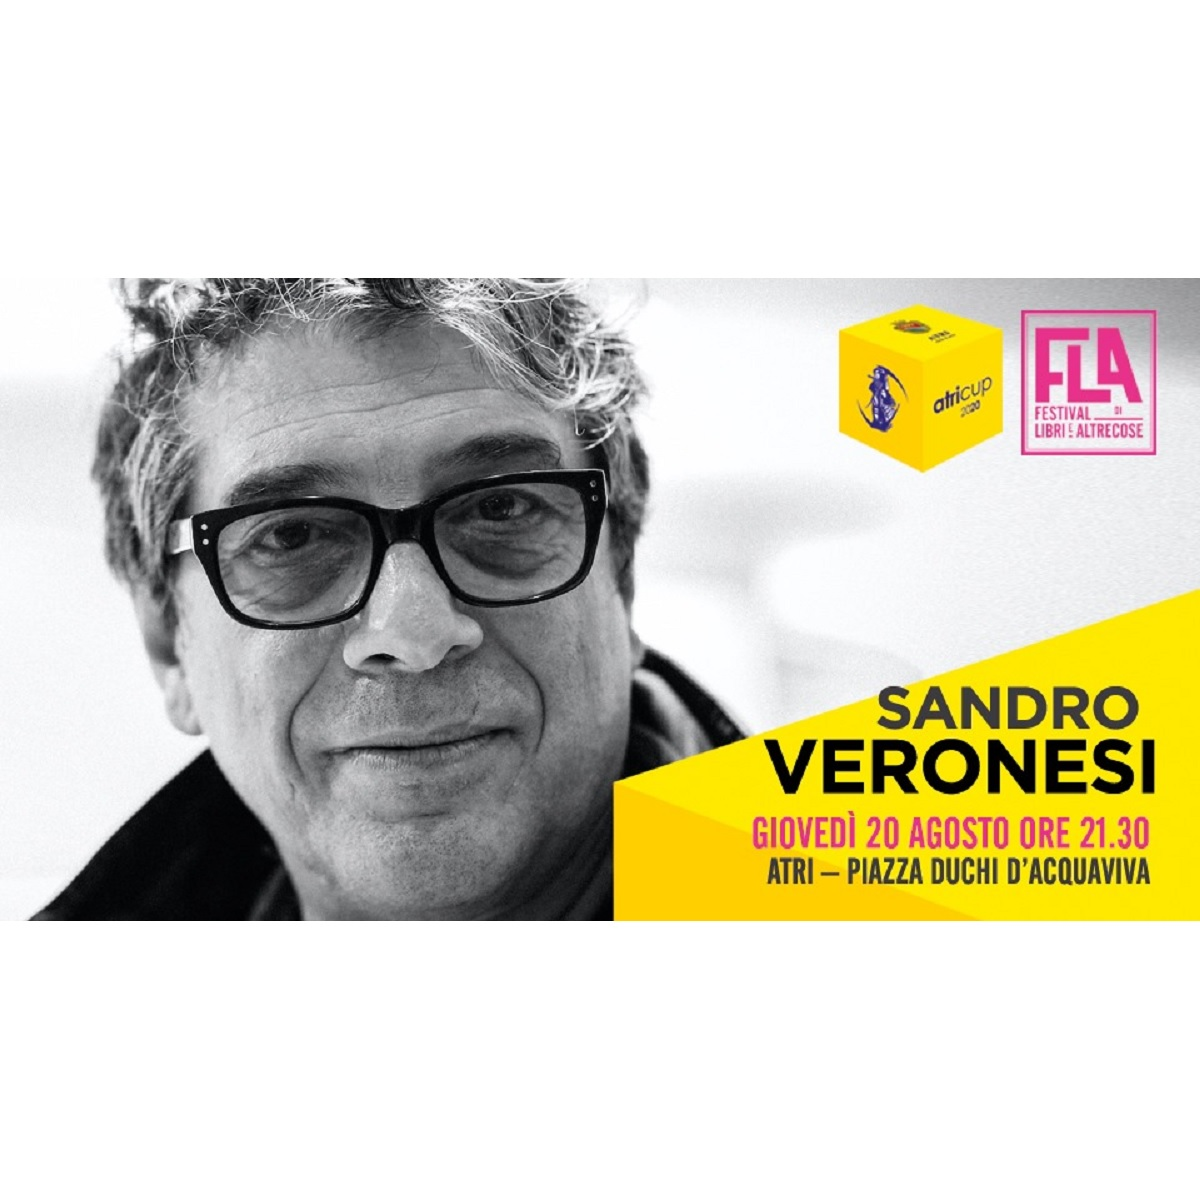 Sandro Veronesi ad Atri il 20 agosto 2020 foto